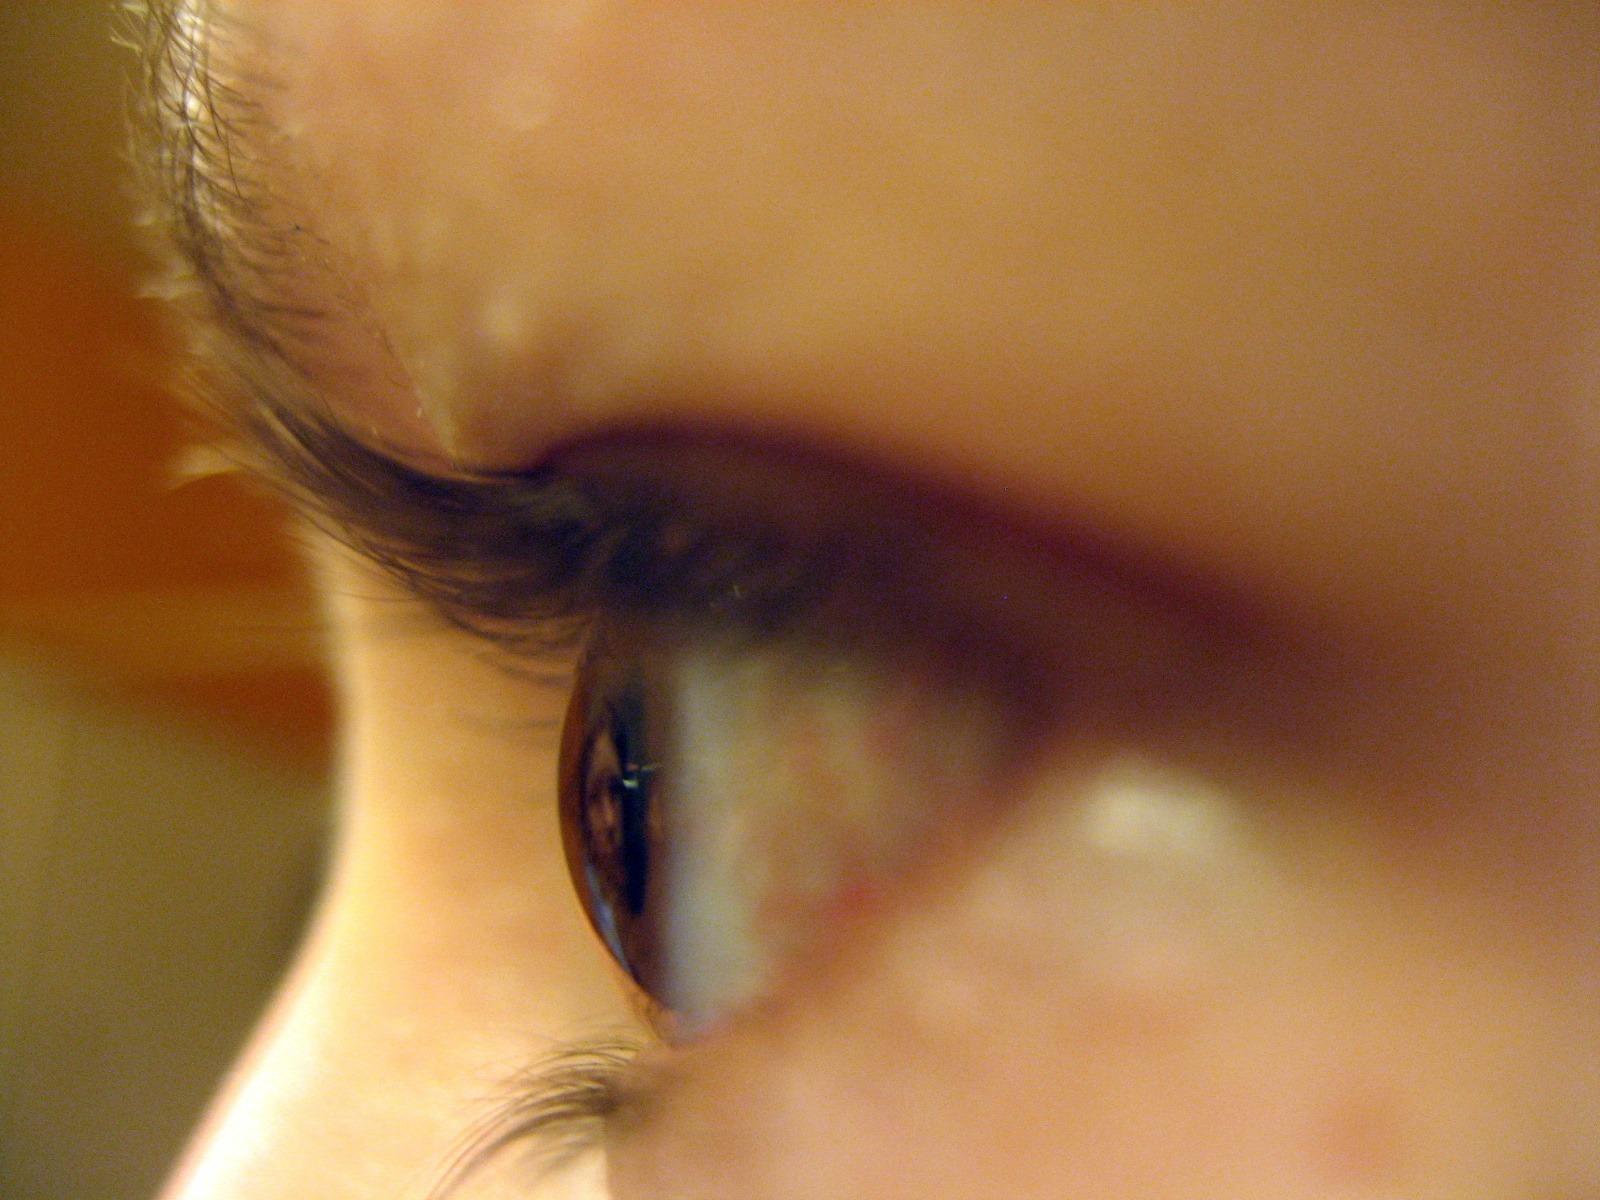 Eyeball